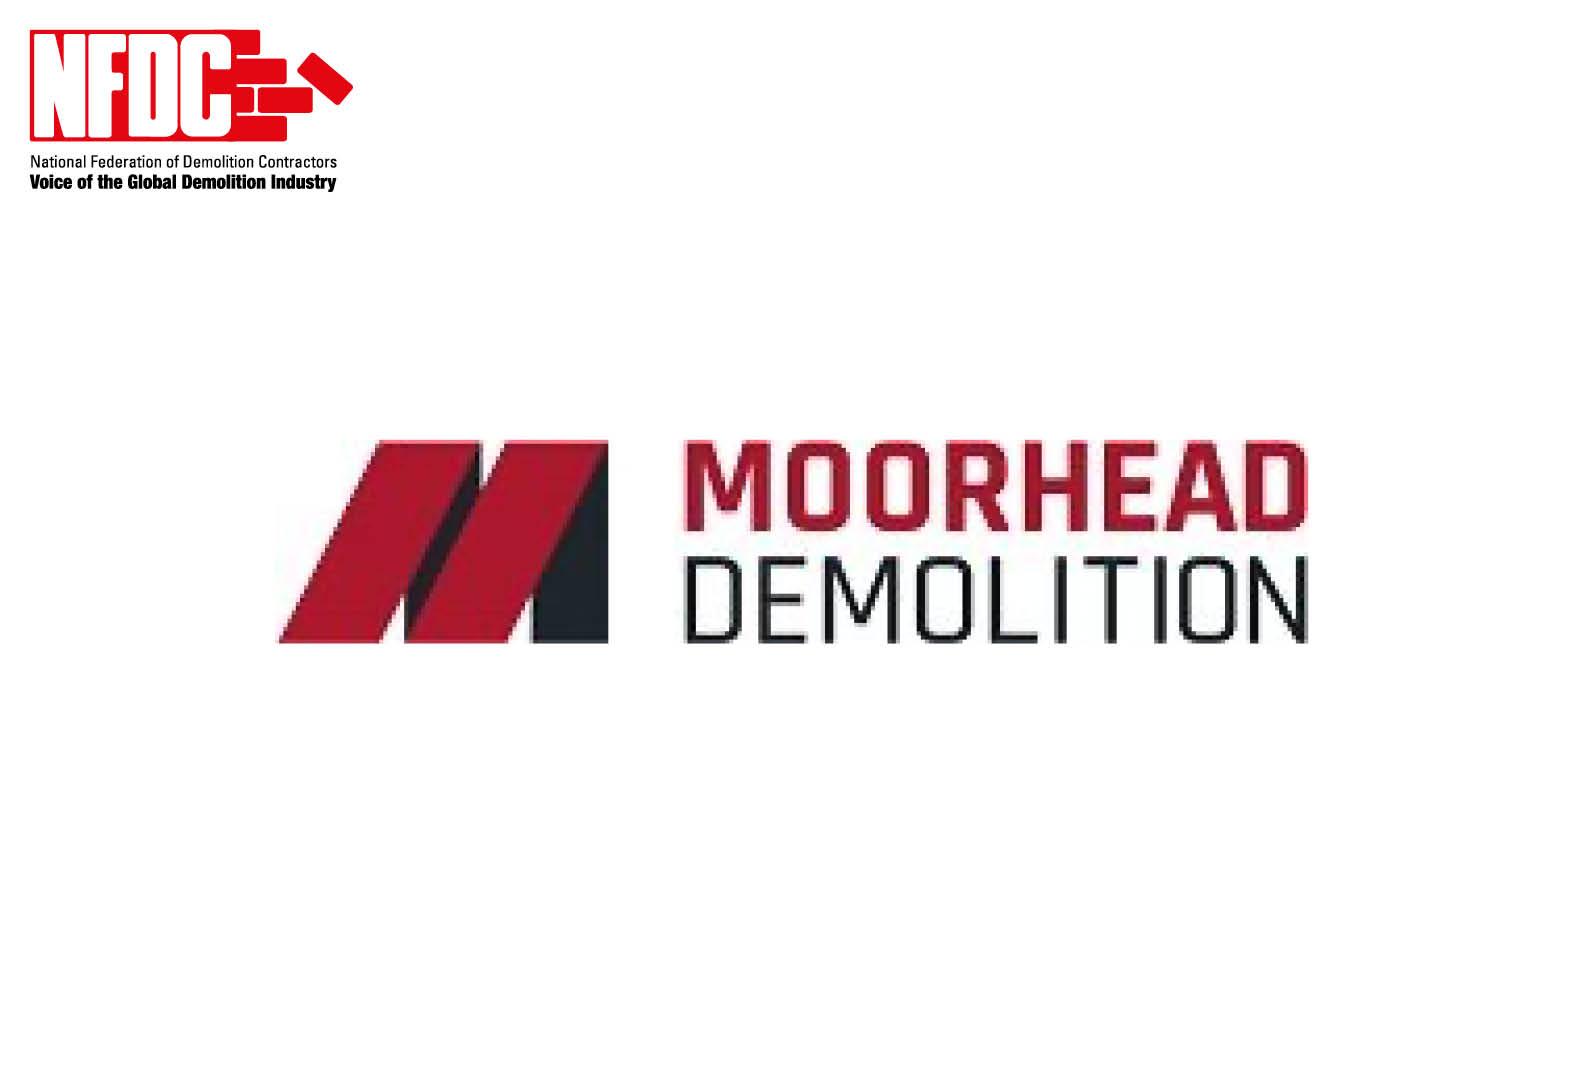 Moorhead Demolition